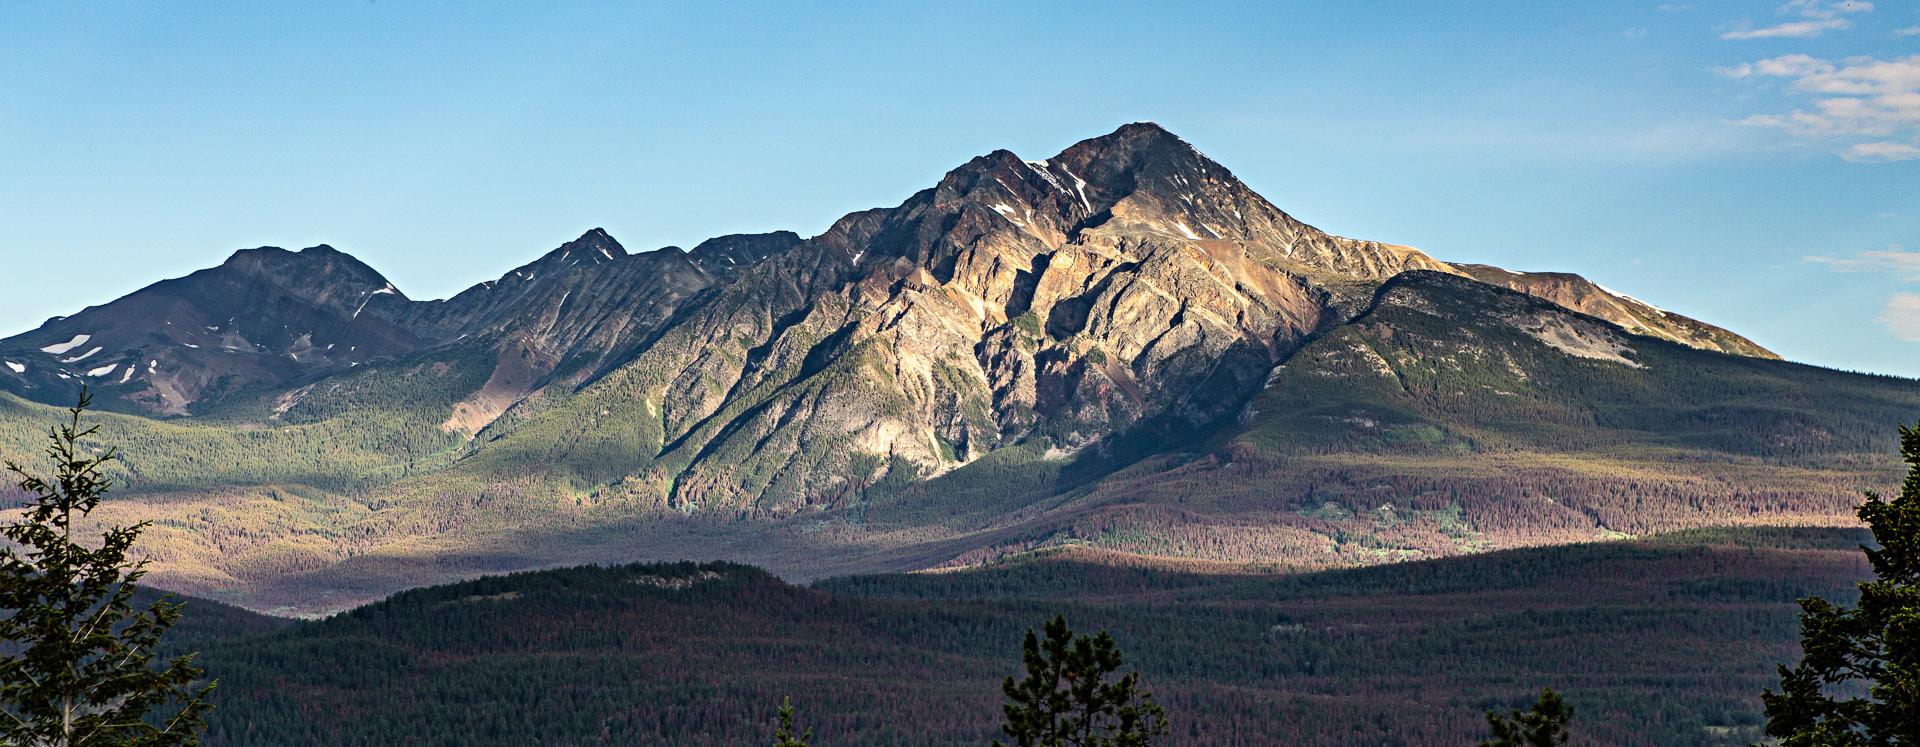 Montagne Jasper Alberta Canada